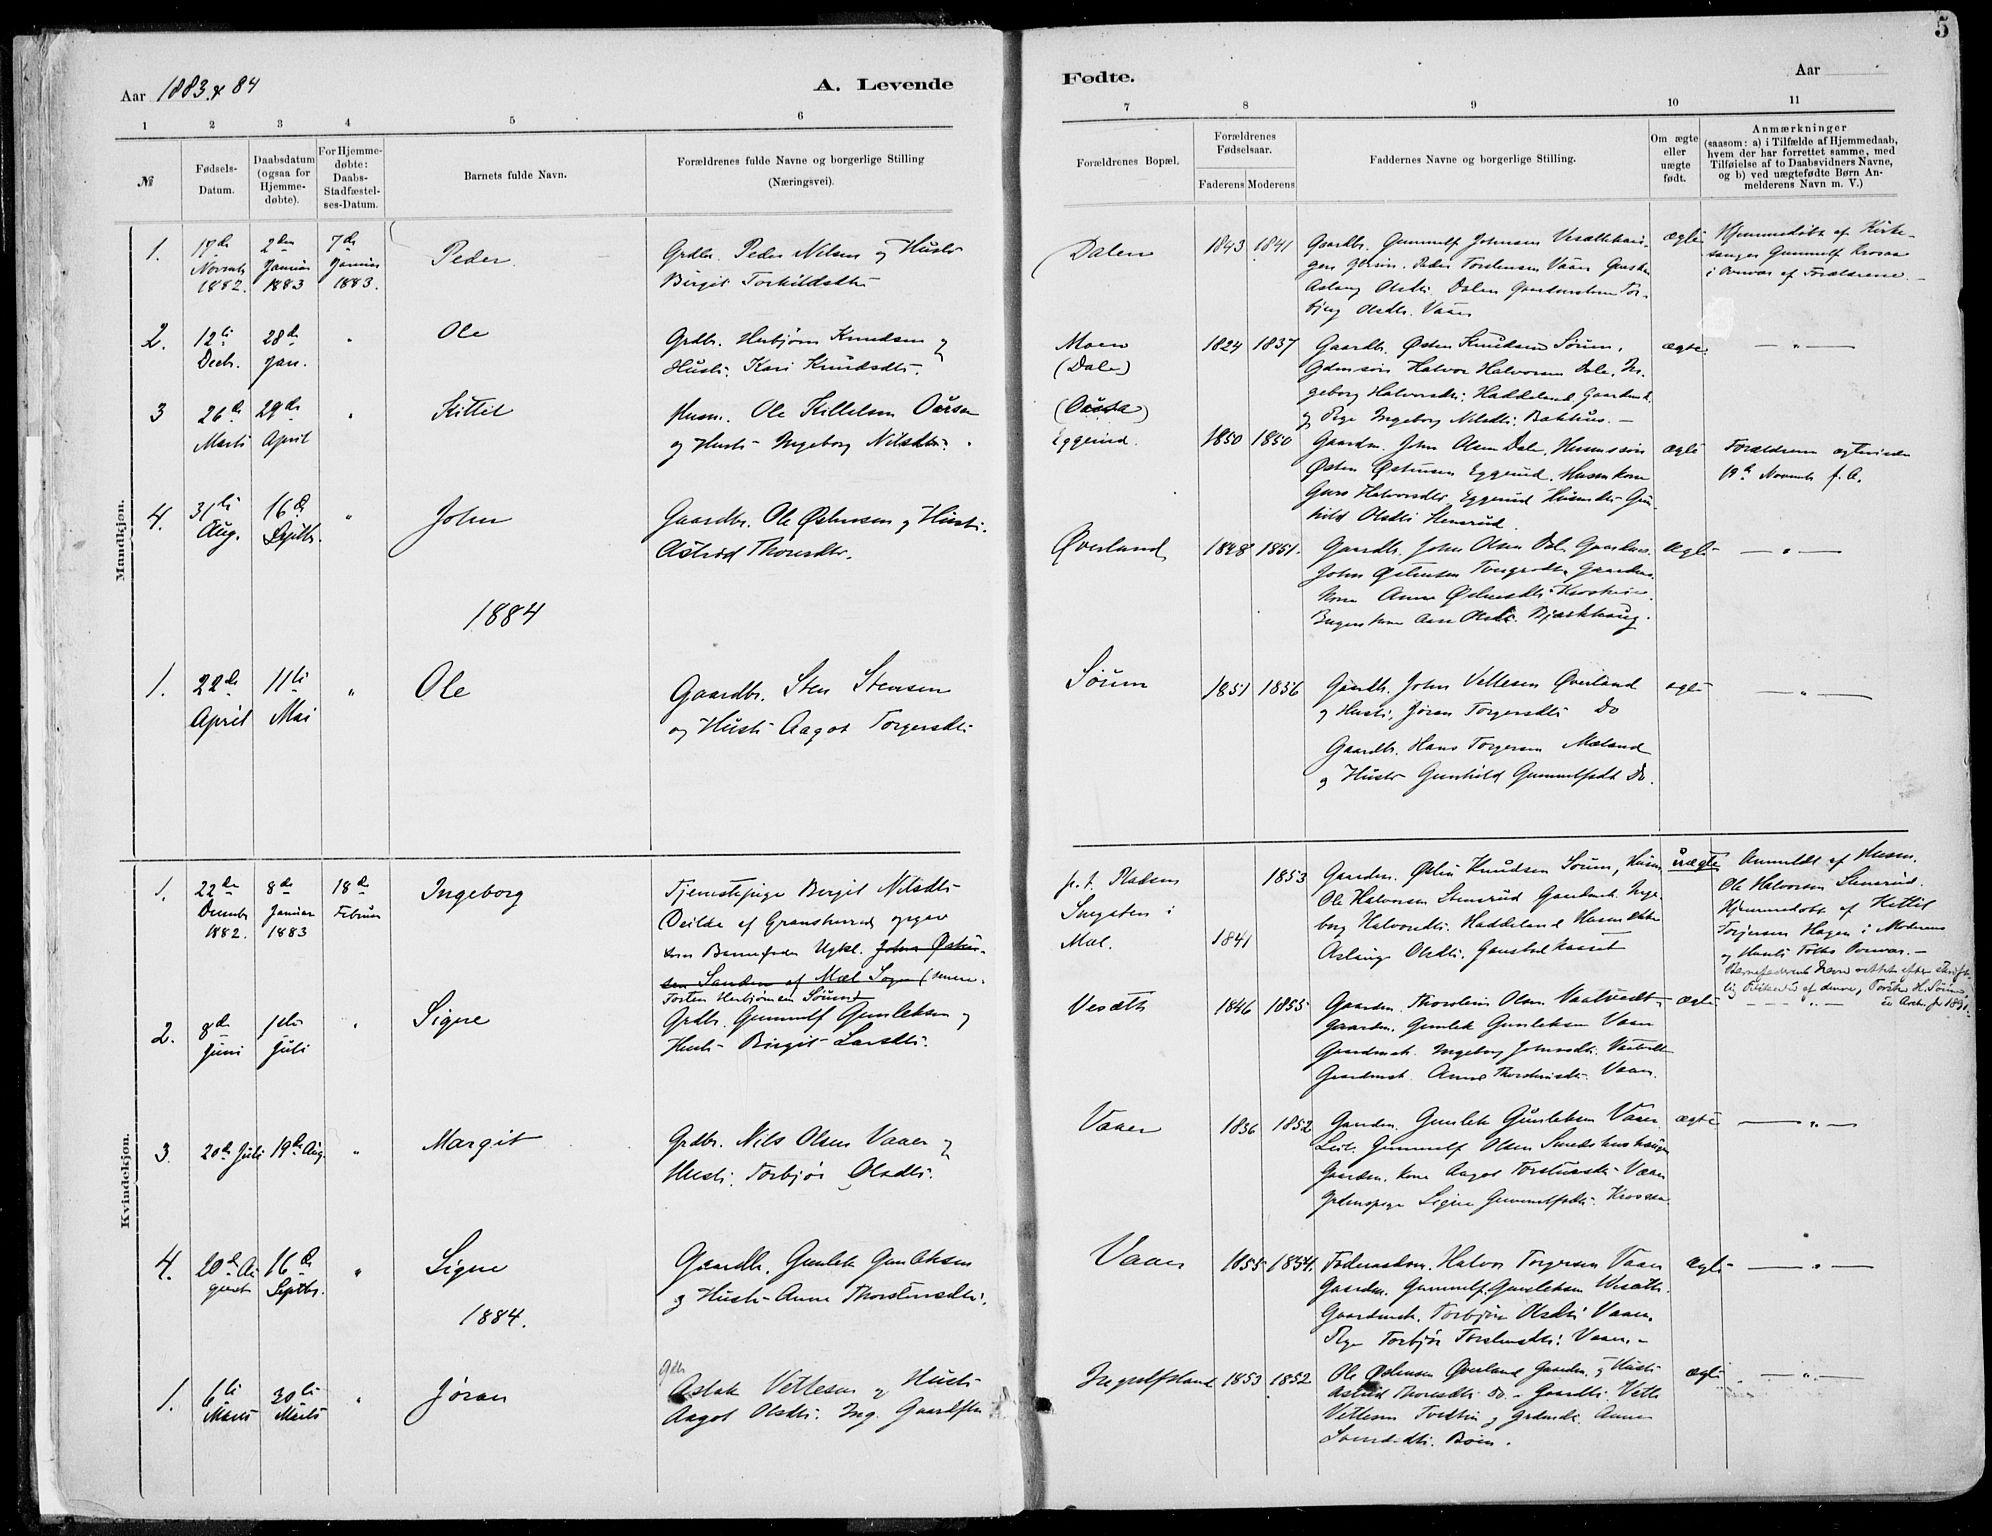 SAKO, Rjukan kirkebøker, F/Fa/L0001: Ministerialbok nr. 1, 1878-1912, s. 5